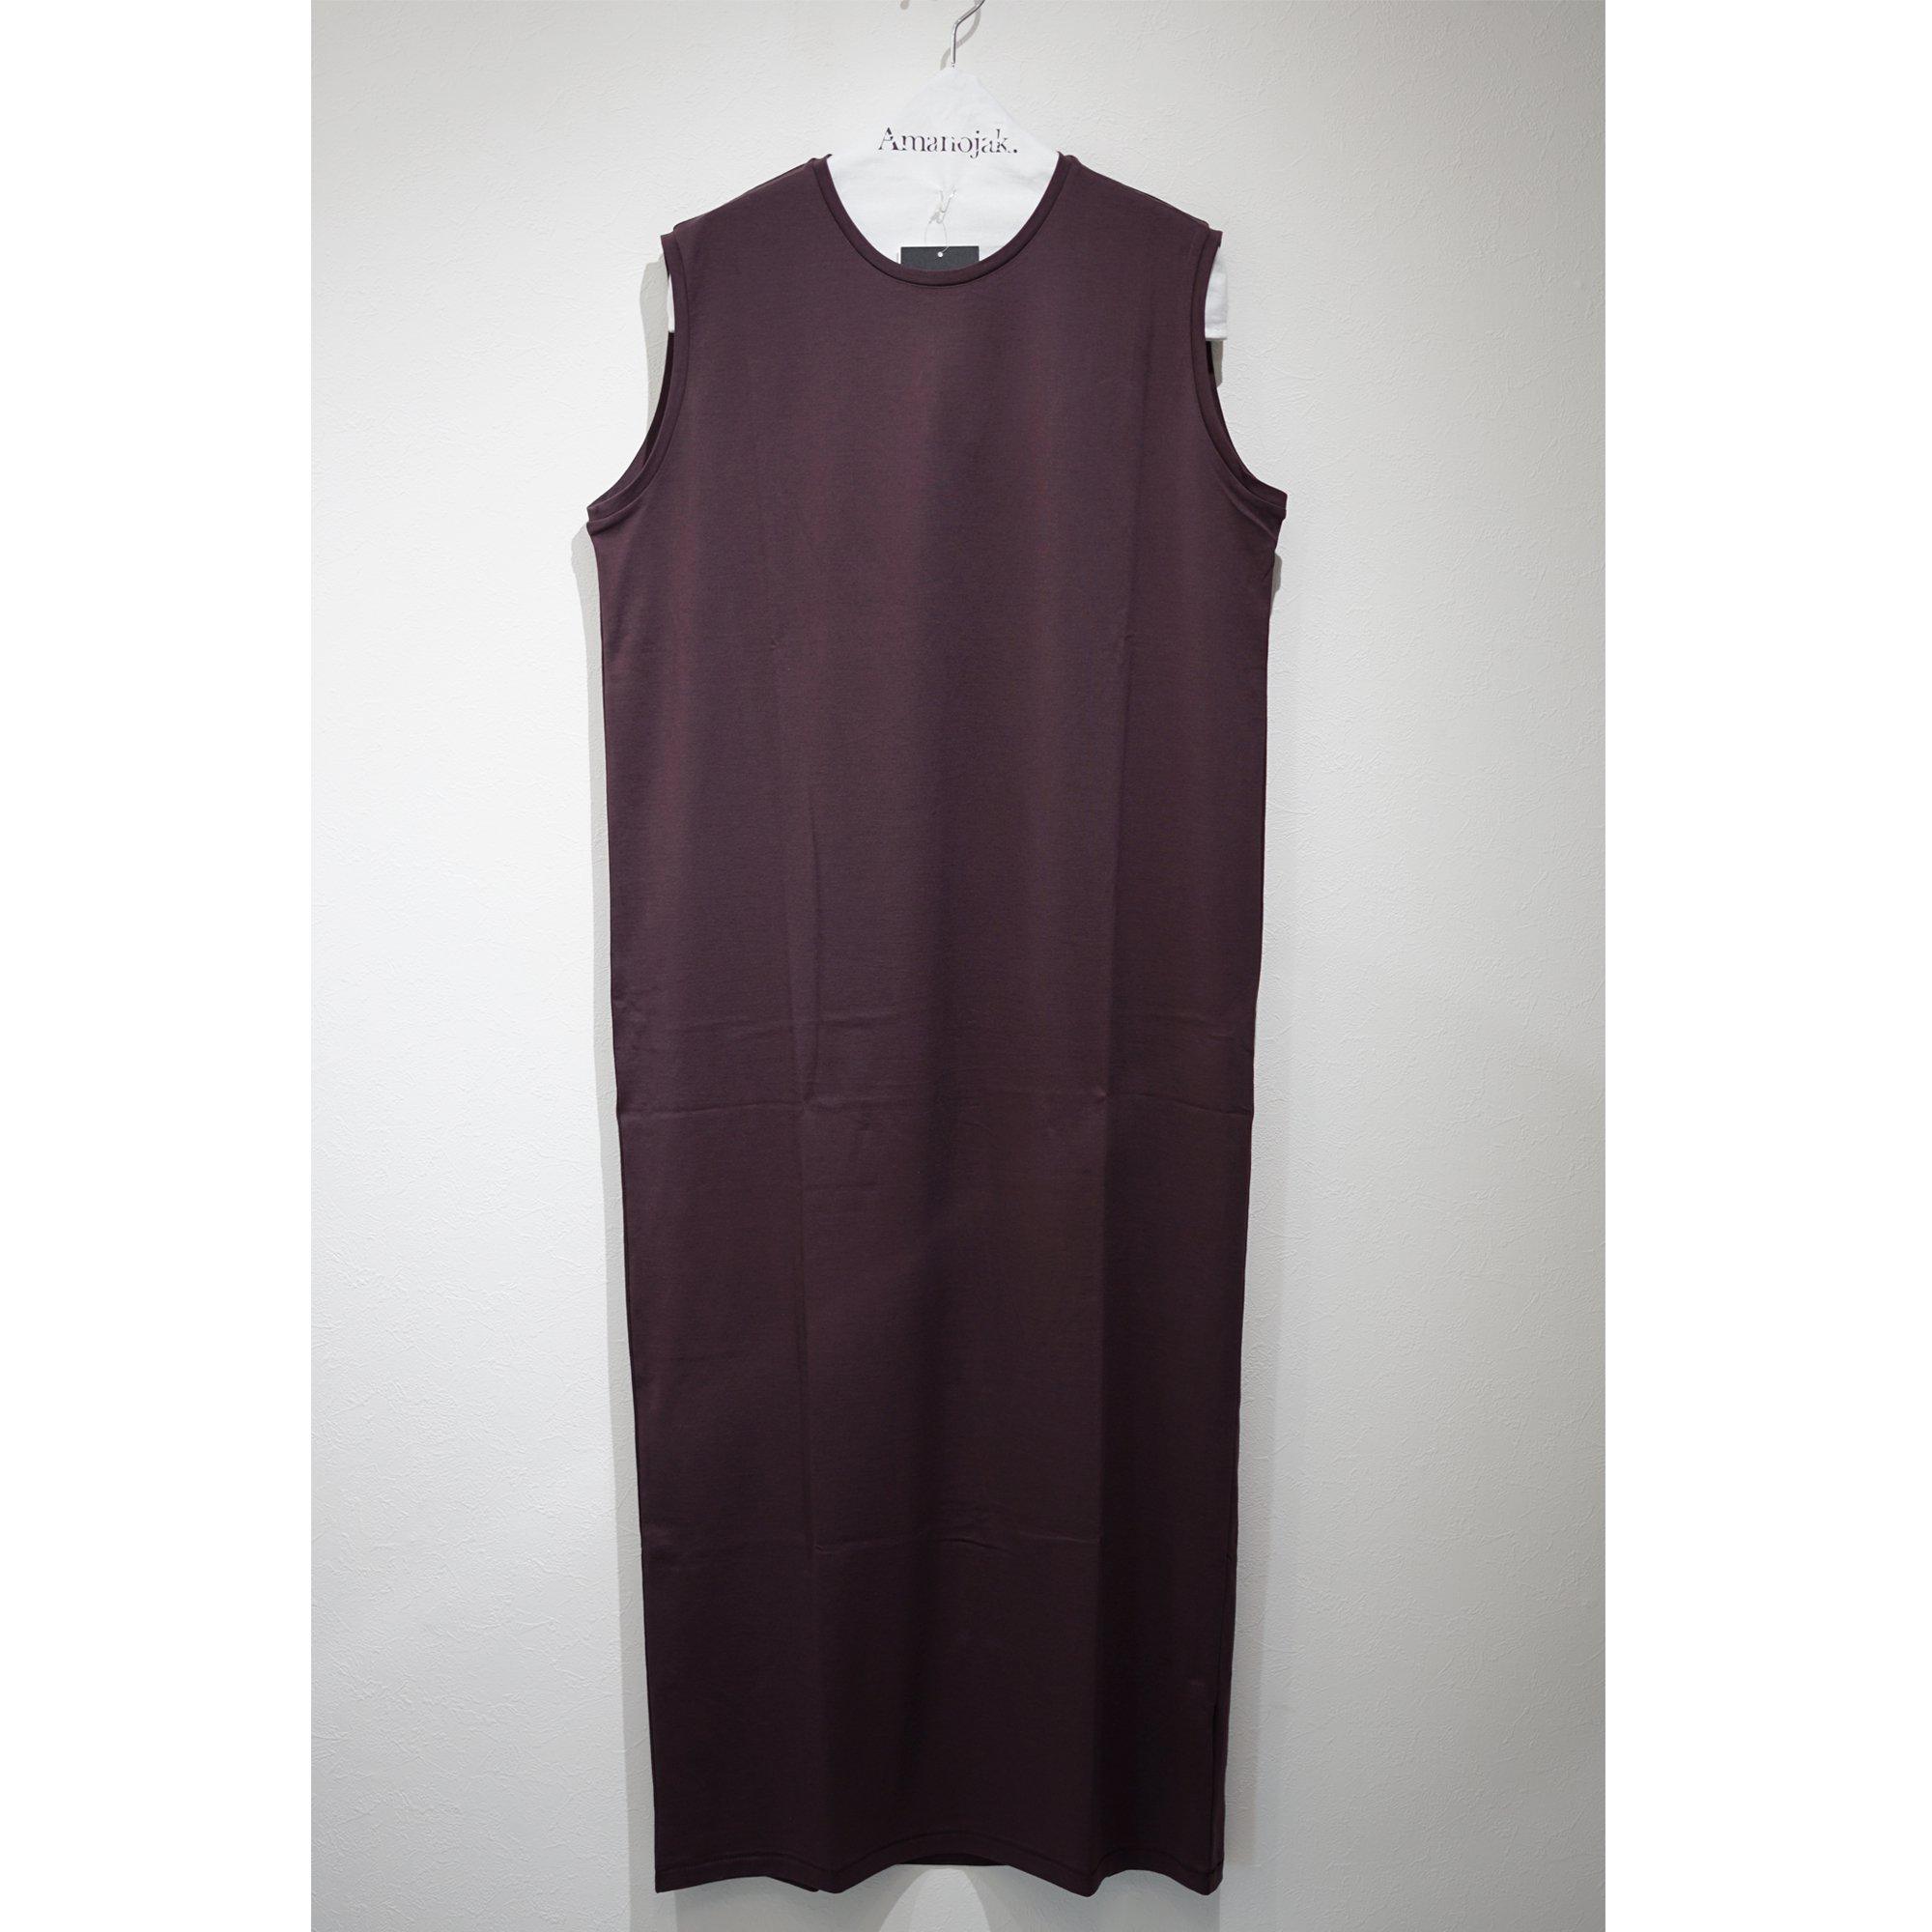 ATON-TANK TOP DRESS BURGUNDY